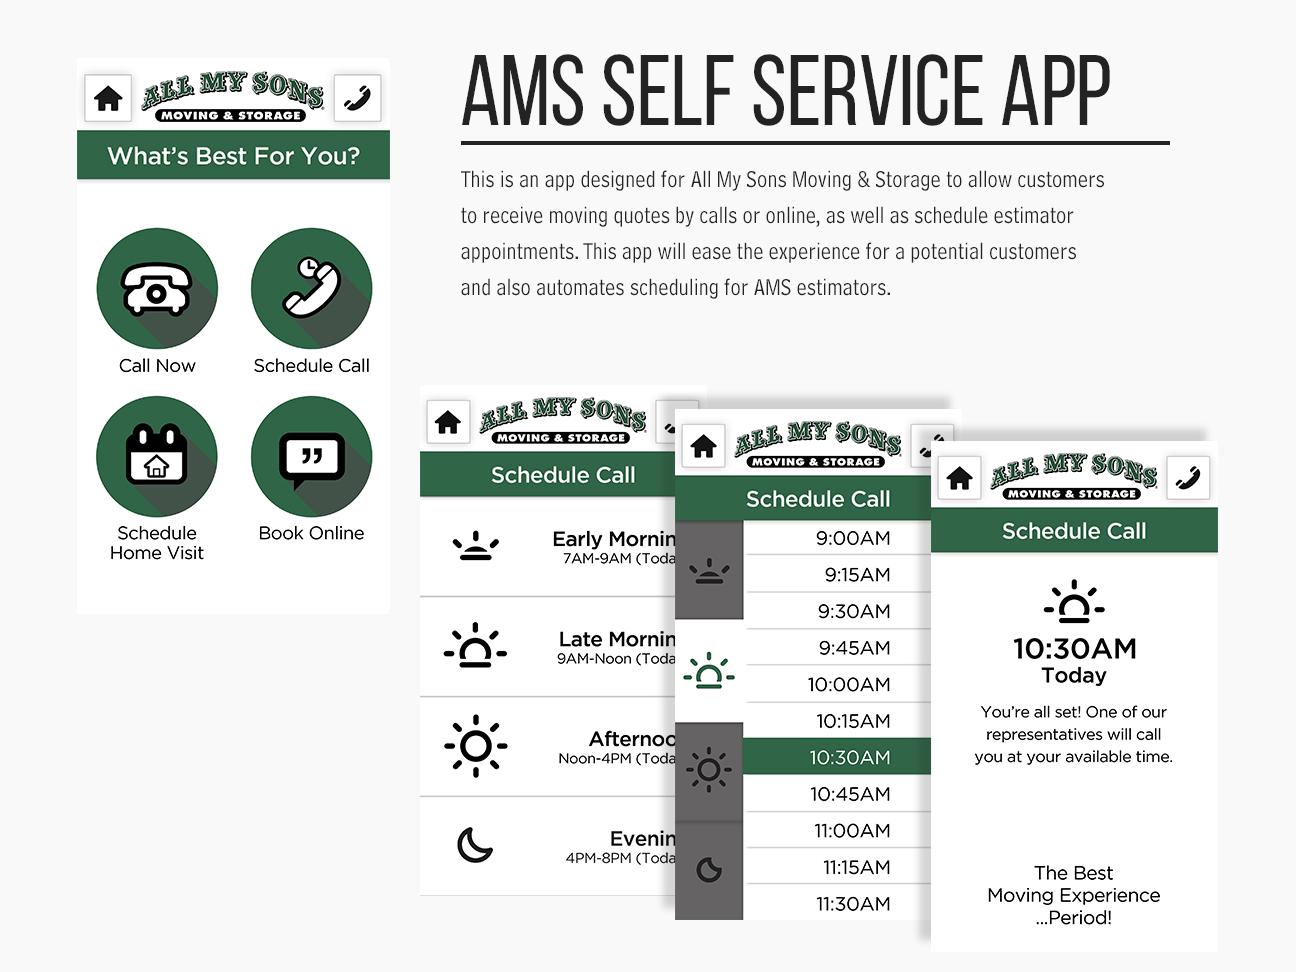 Self service app display